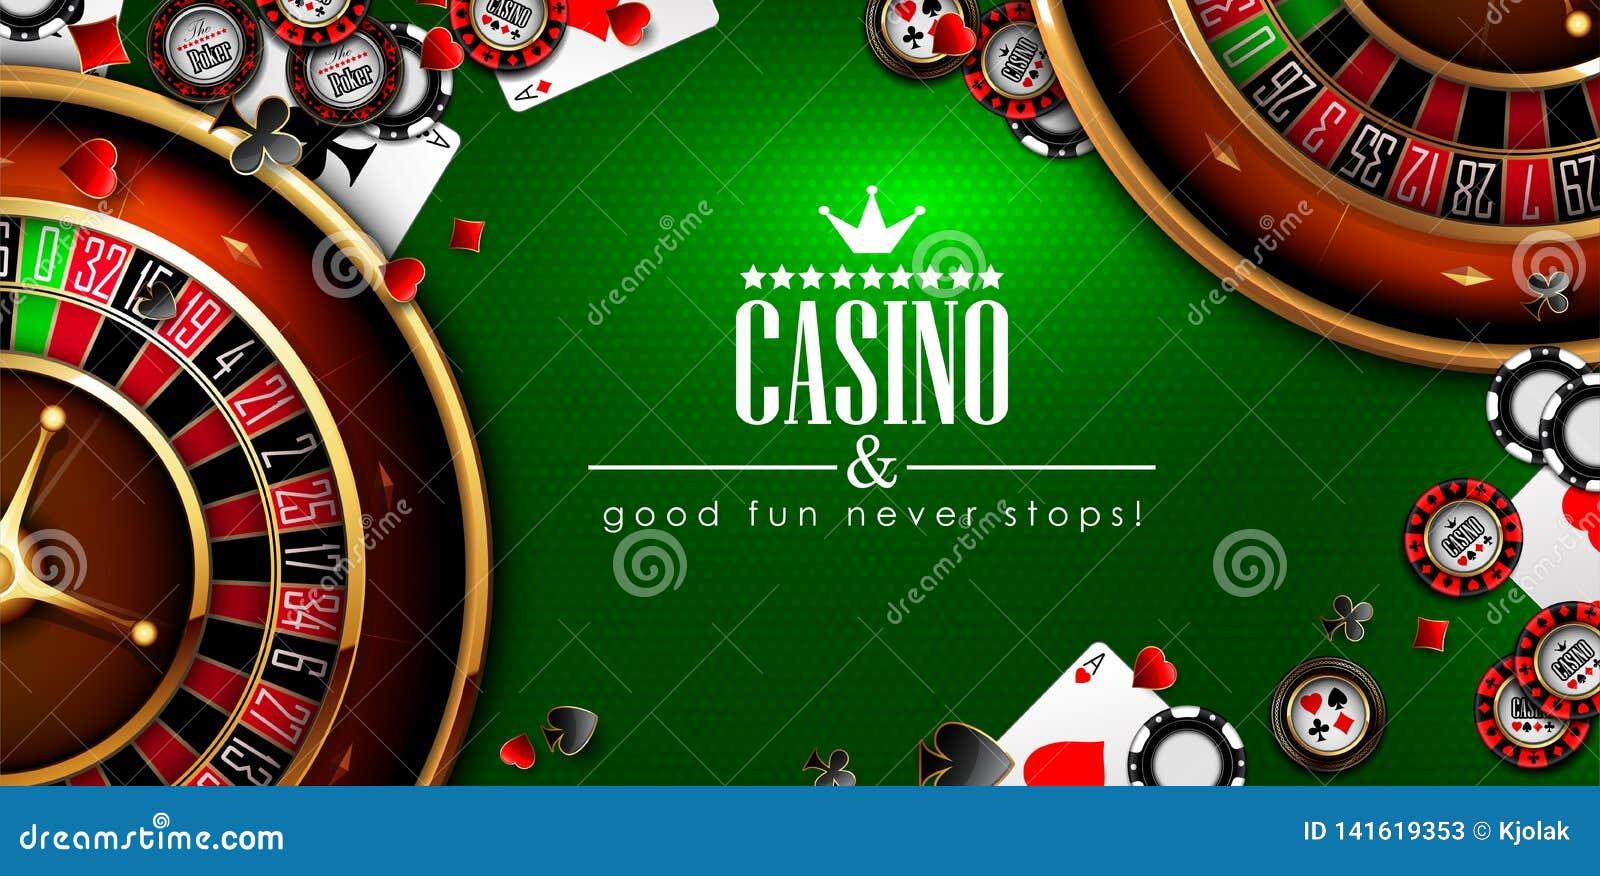 Realistic games casinos odobo 16721